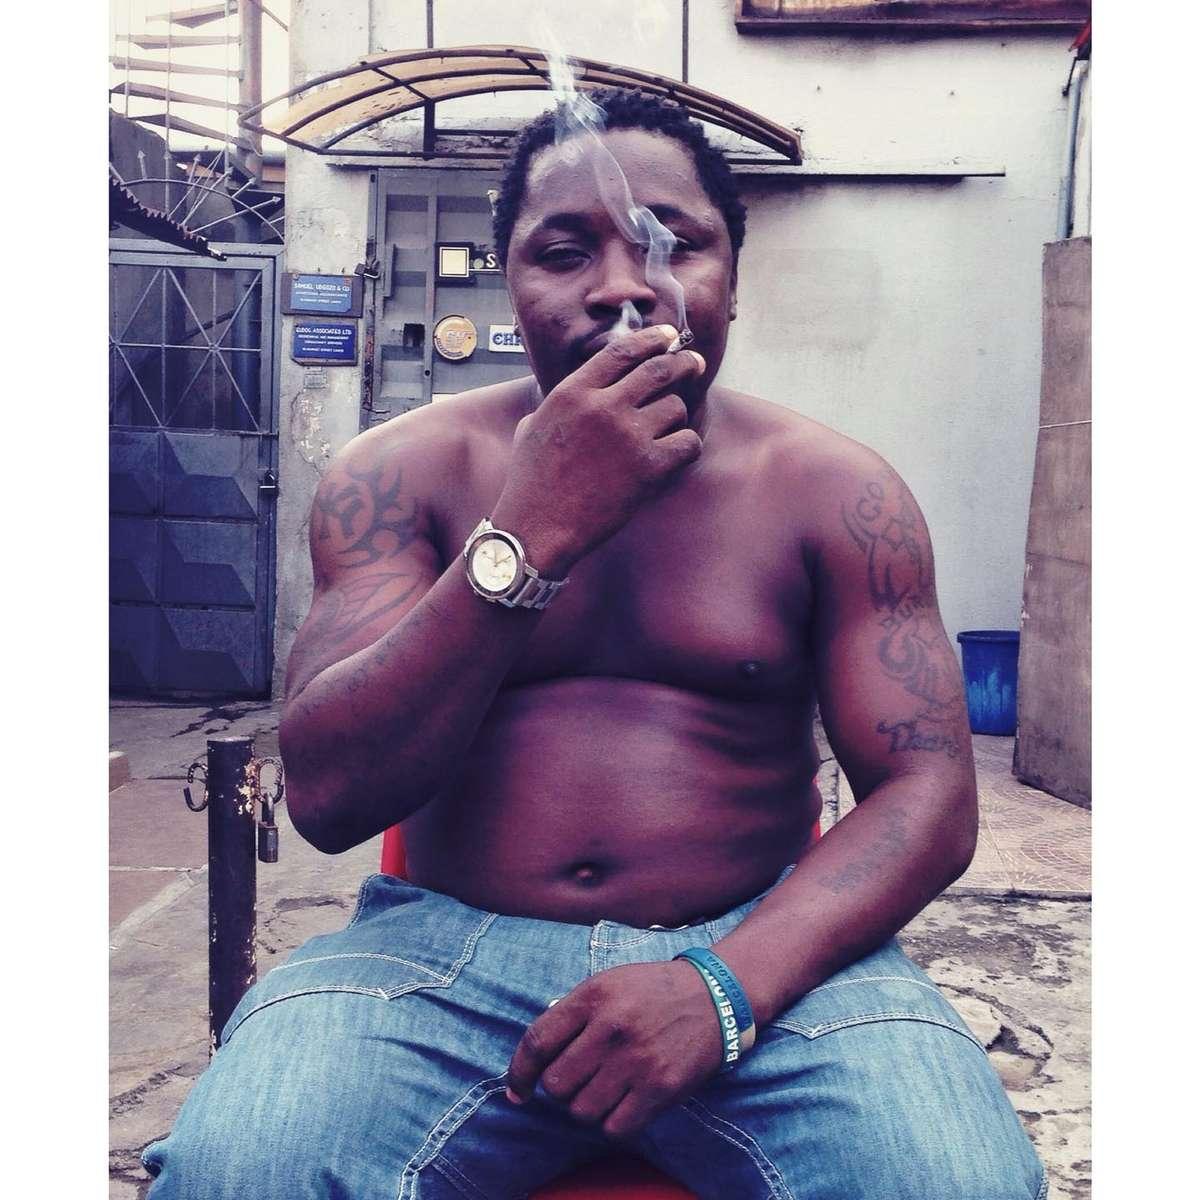 Area Boy smokes his morning J. Lagos, Nigeria. May 2014.